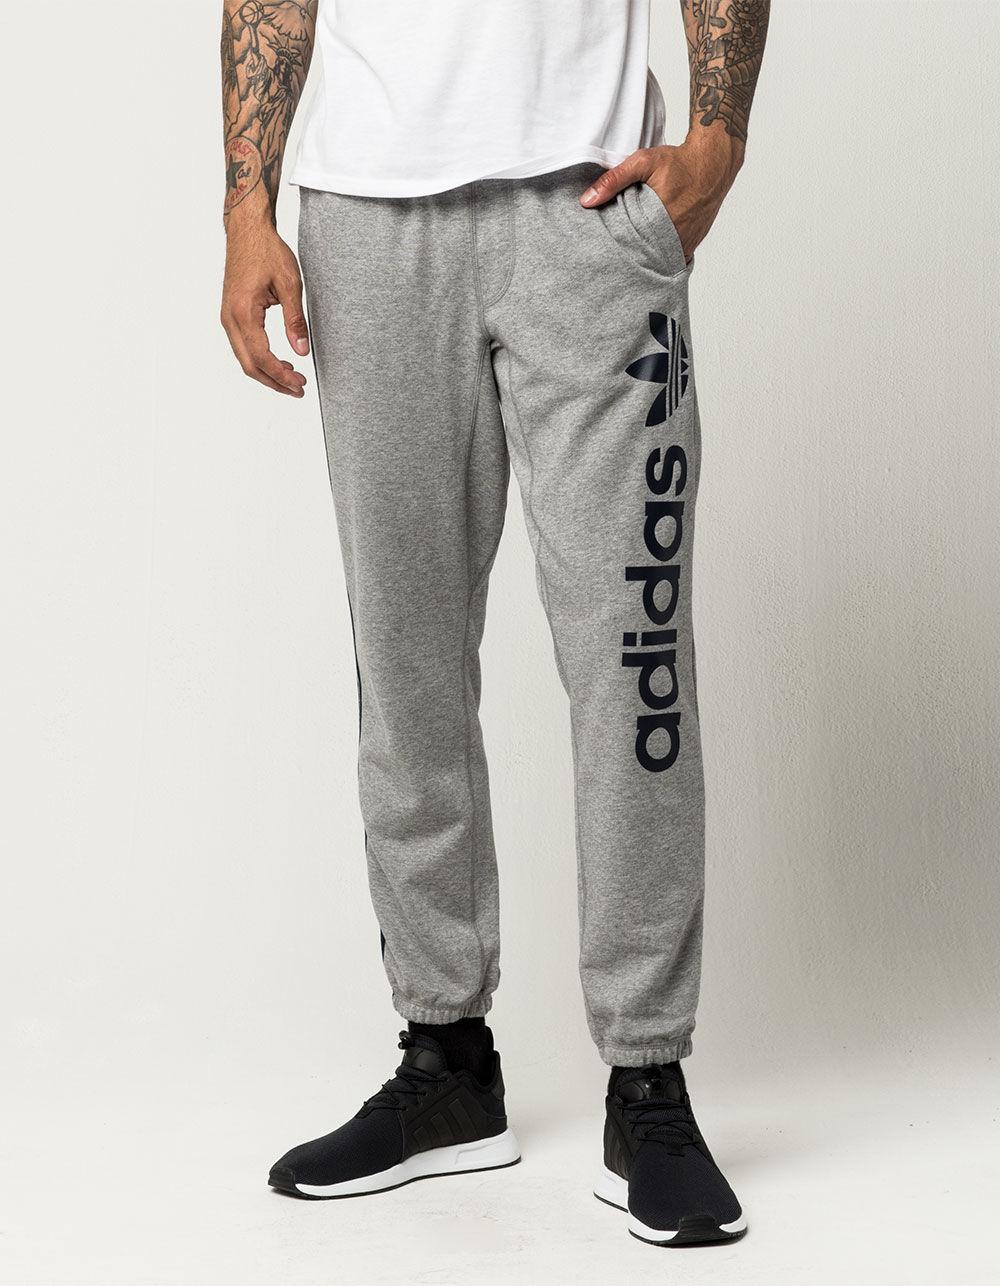 d4c6eac33 adidas Blackbird Mens Sweatpants in Gray for Men - Lyst